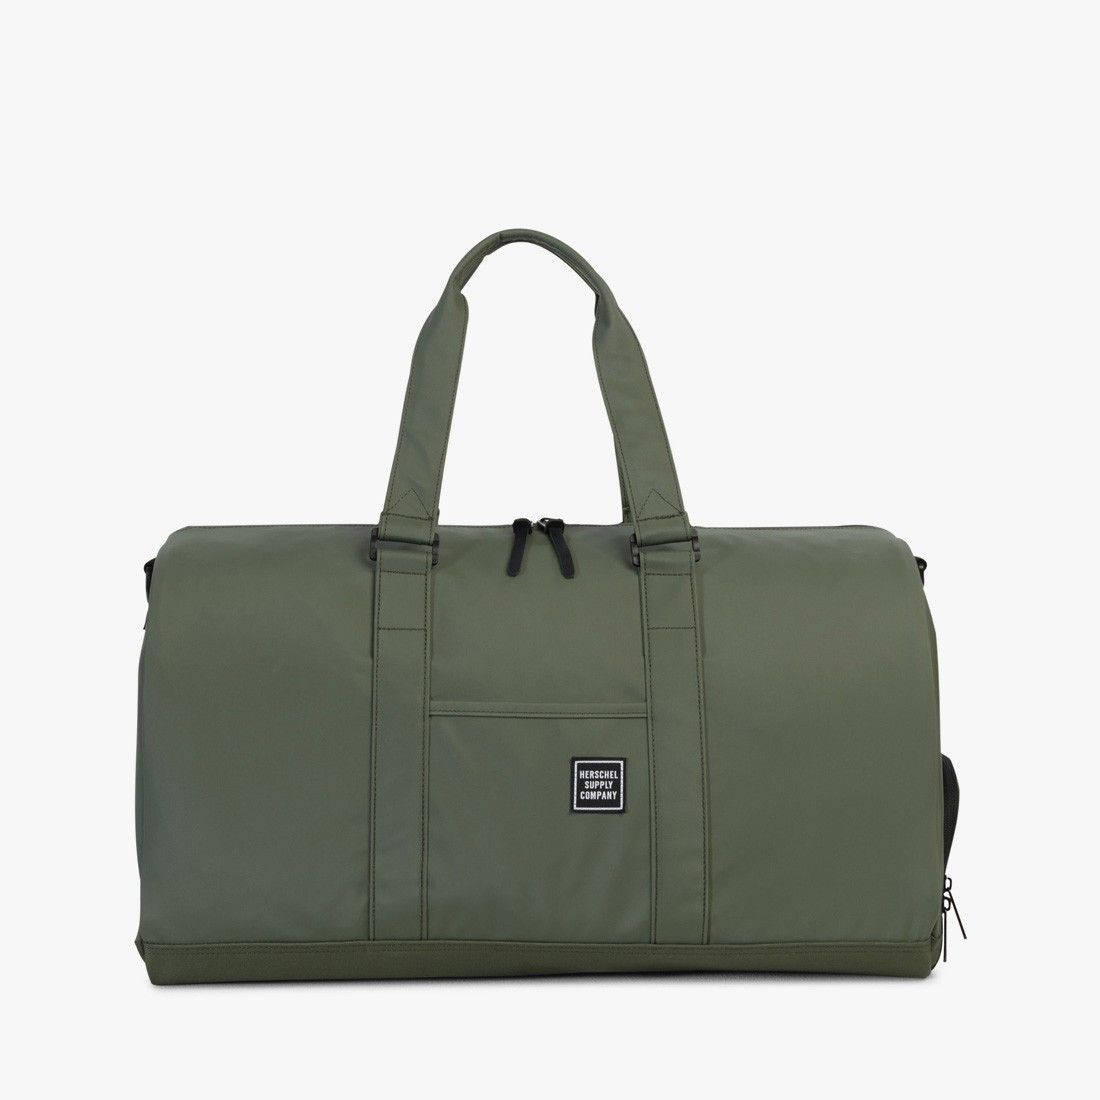 b660134793c87 Novel Duffle Bag Bettle Studio Series